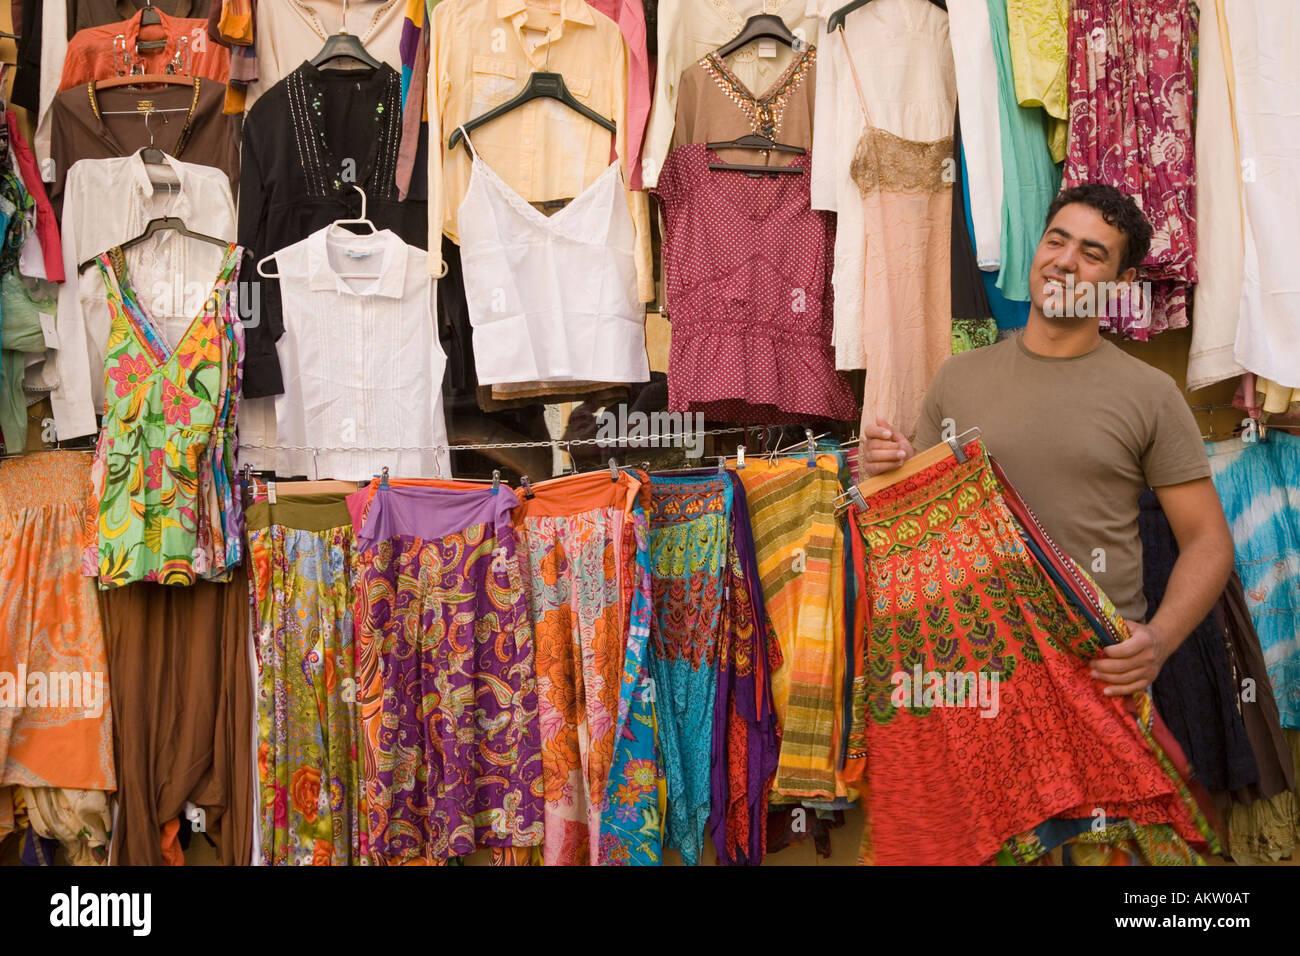 Shop Cheap Clothing